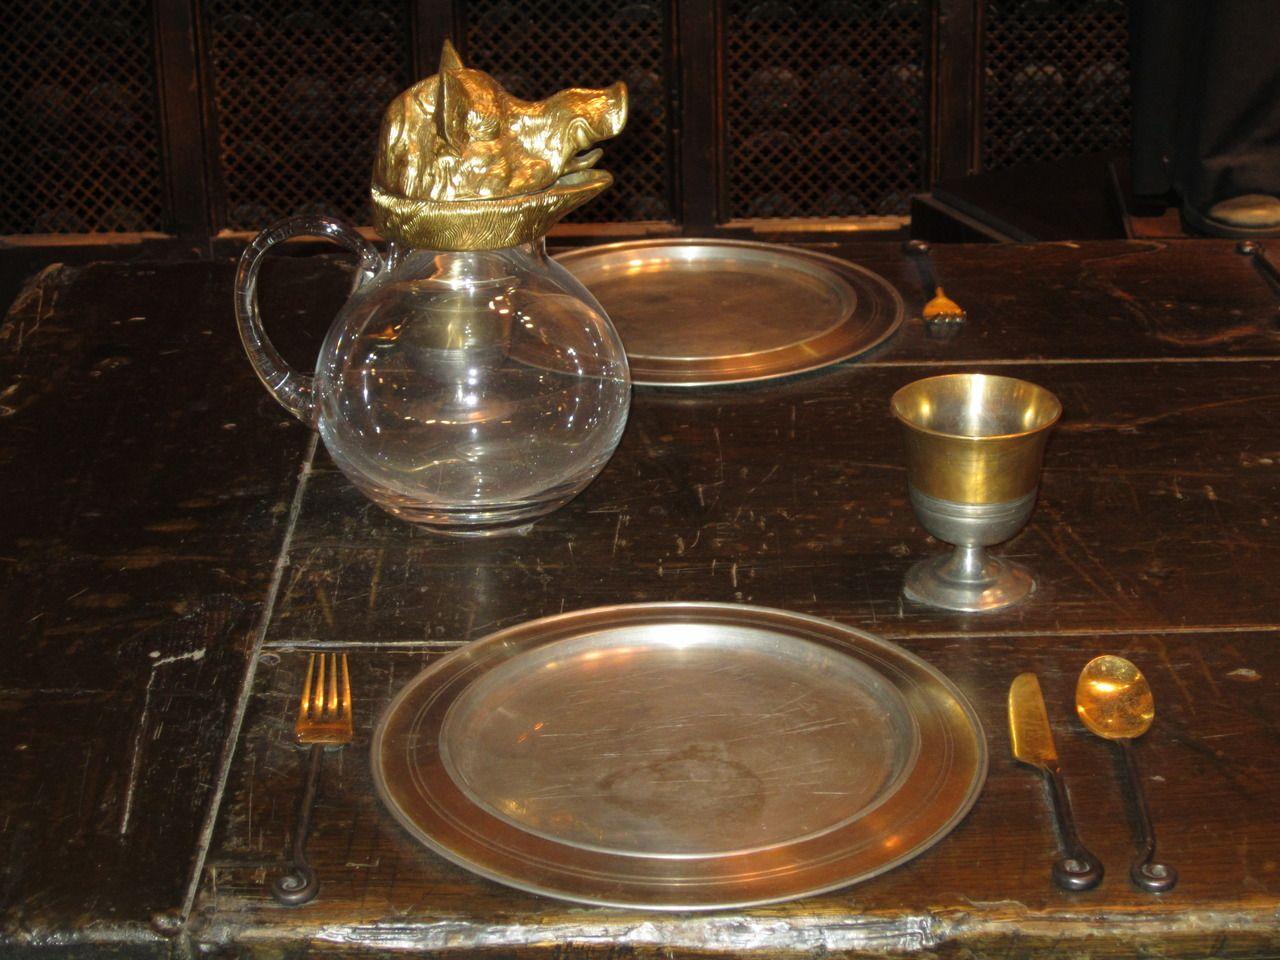 Harry potter stuff · Hogshead Jug \u0026 Tableware & Hogshead Jug \u0026 Tableware   Harry Potter Studio Tour   Pinterest ...